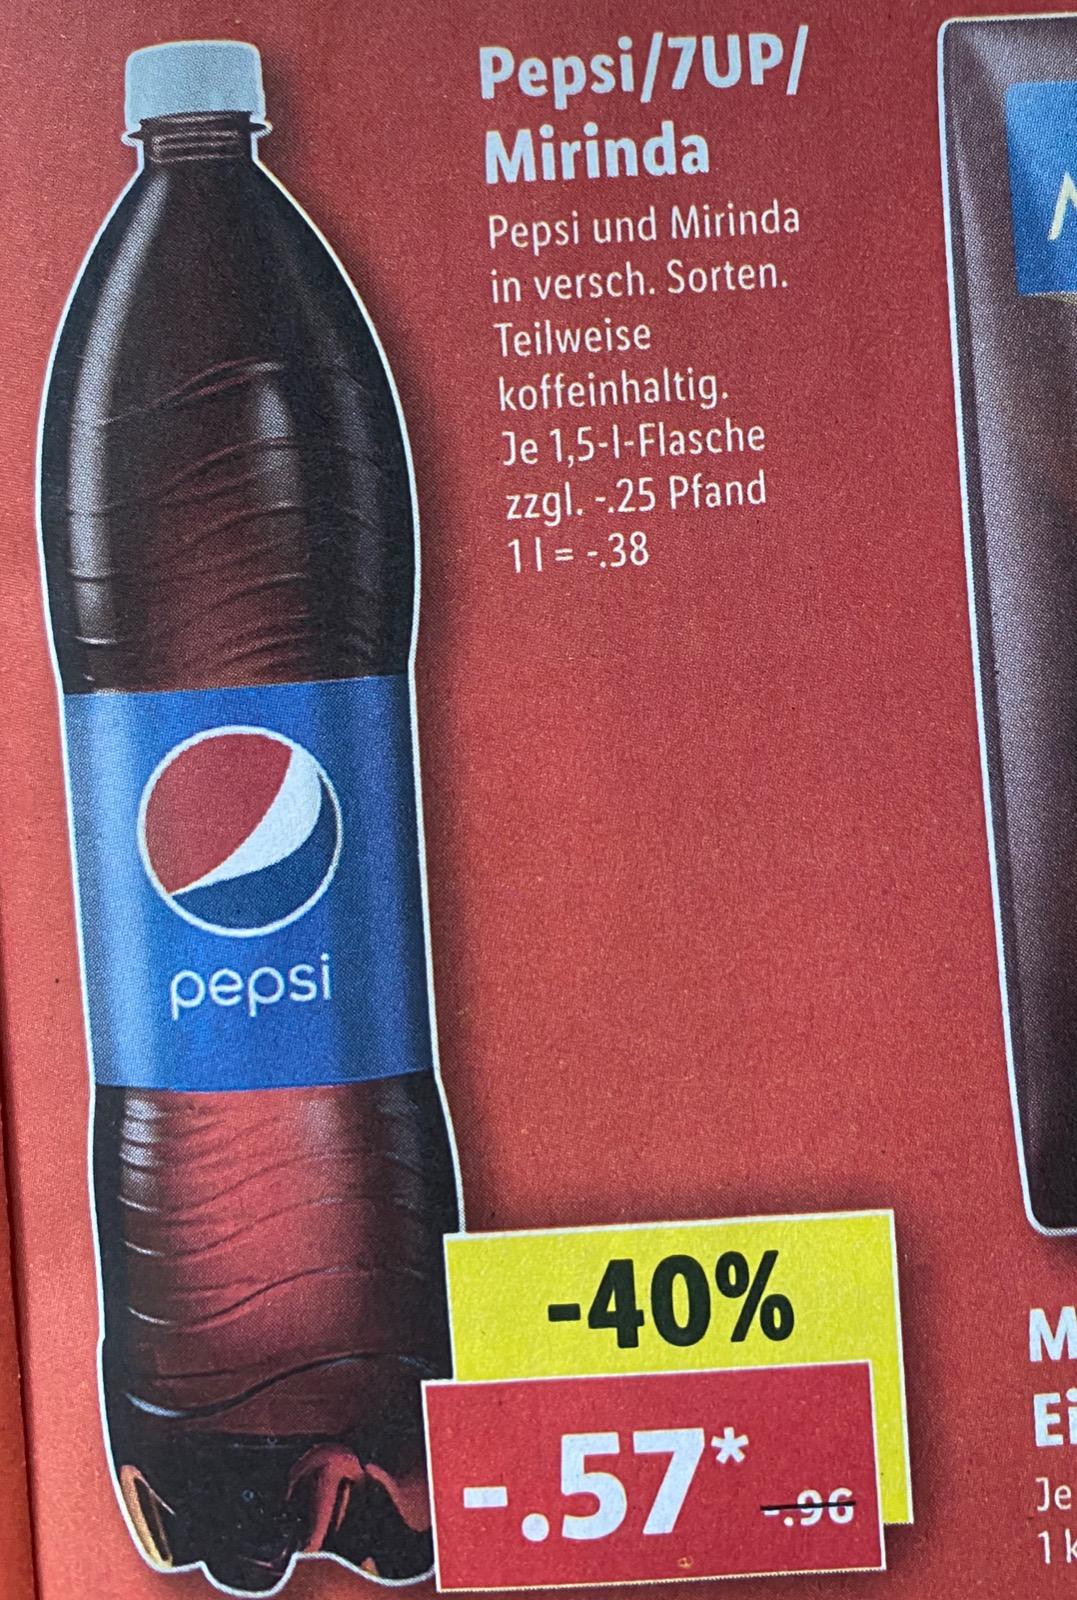 Pepsi / 7UP / Mirinda je 1,5l Flasche nur 57 Cent